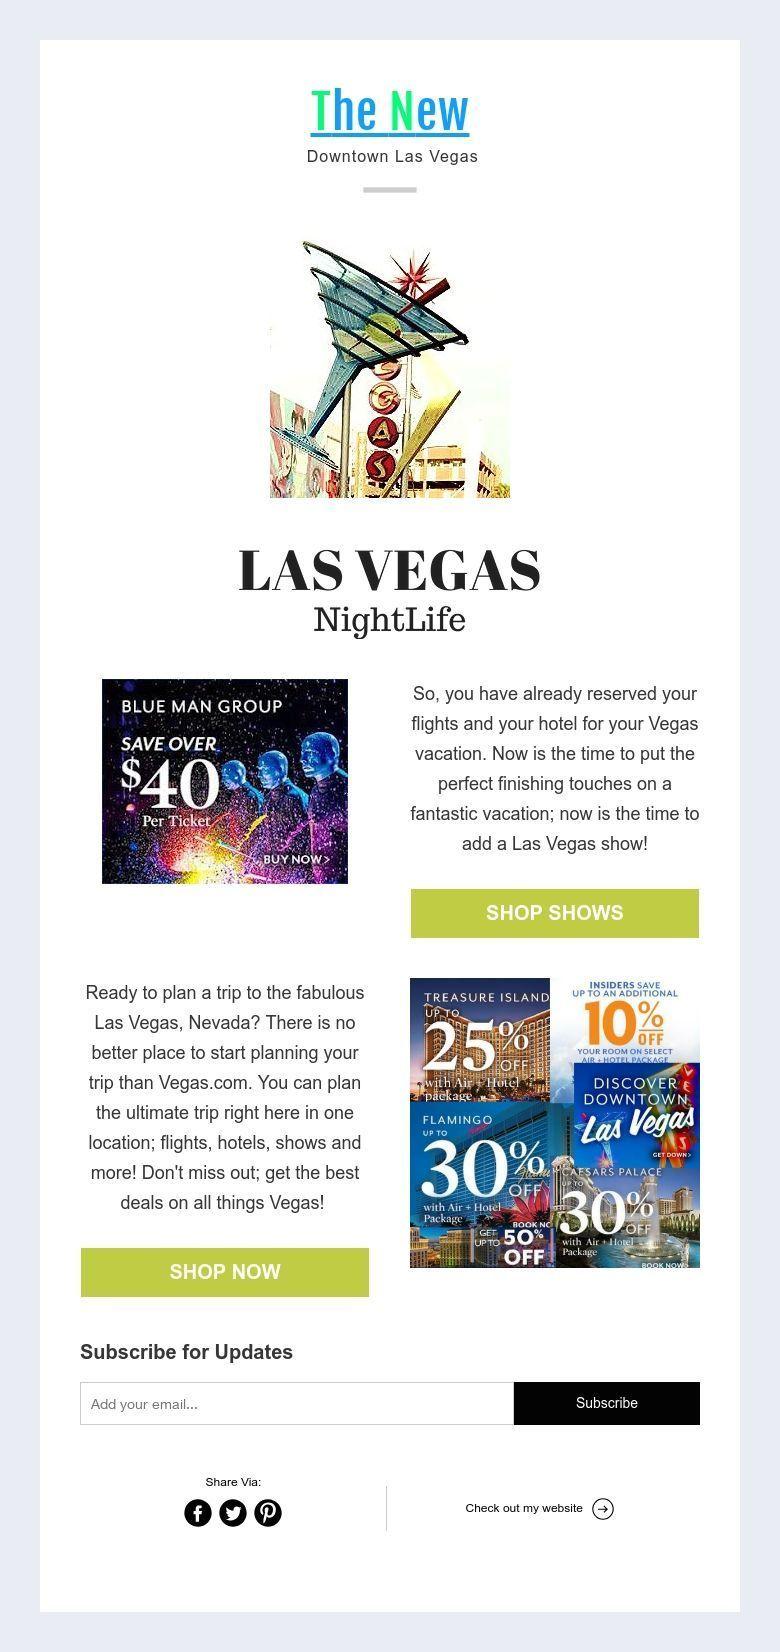 The New Downtown Las Vegas